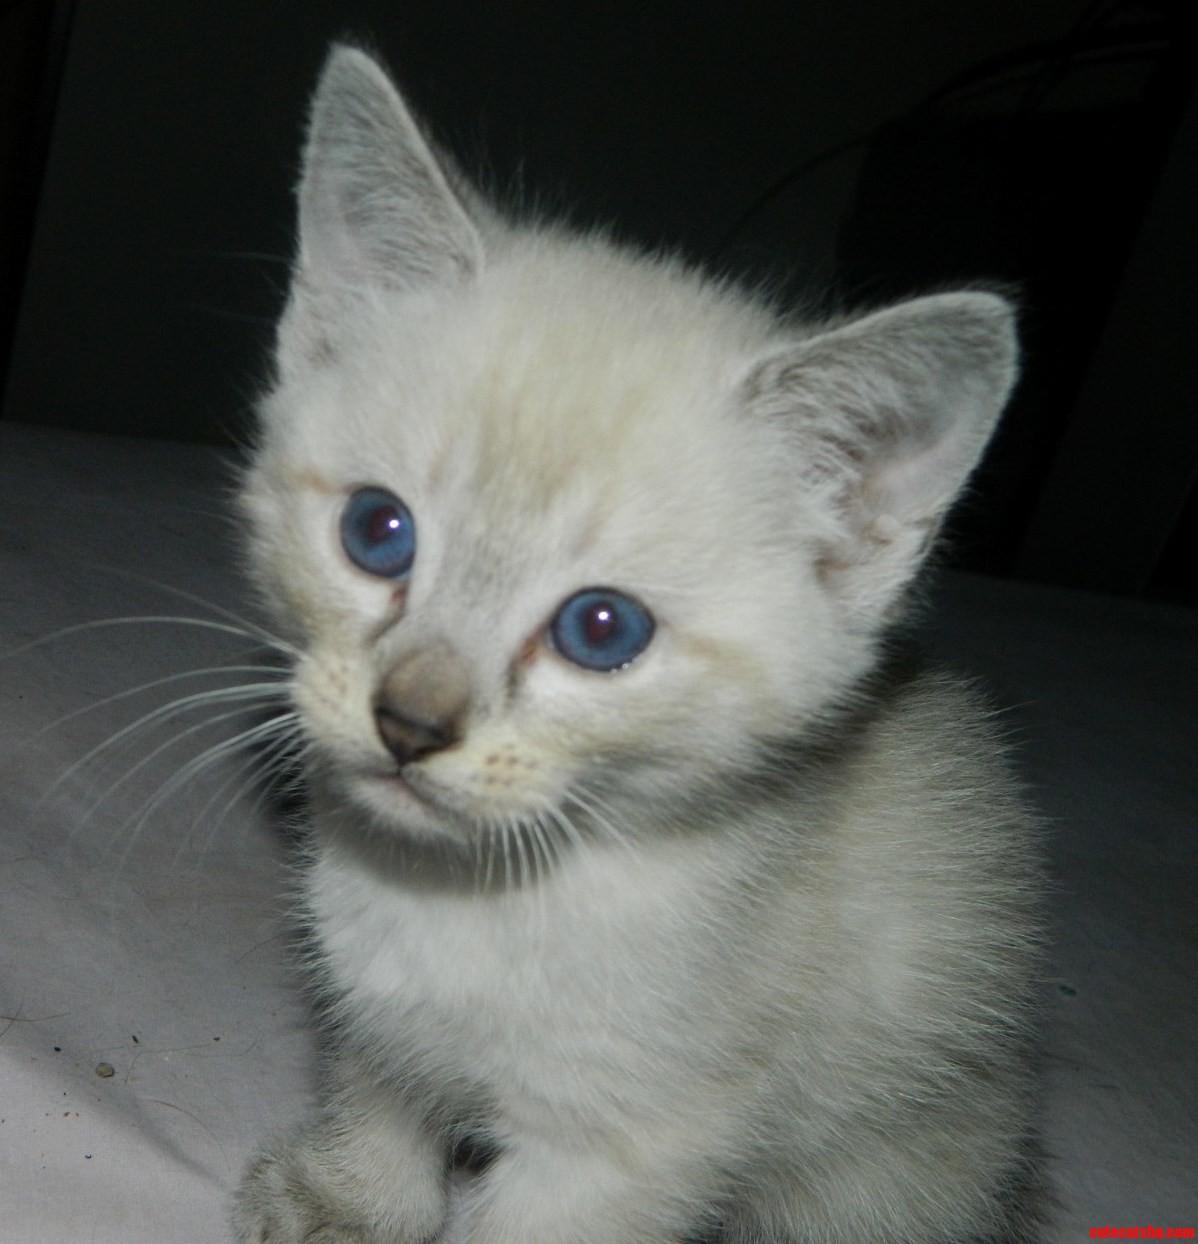 My New Little Buddy